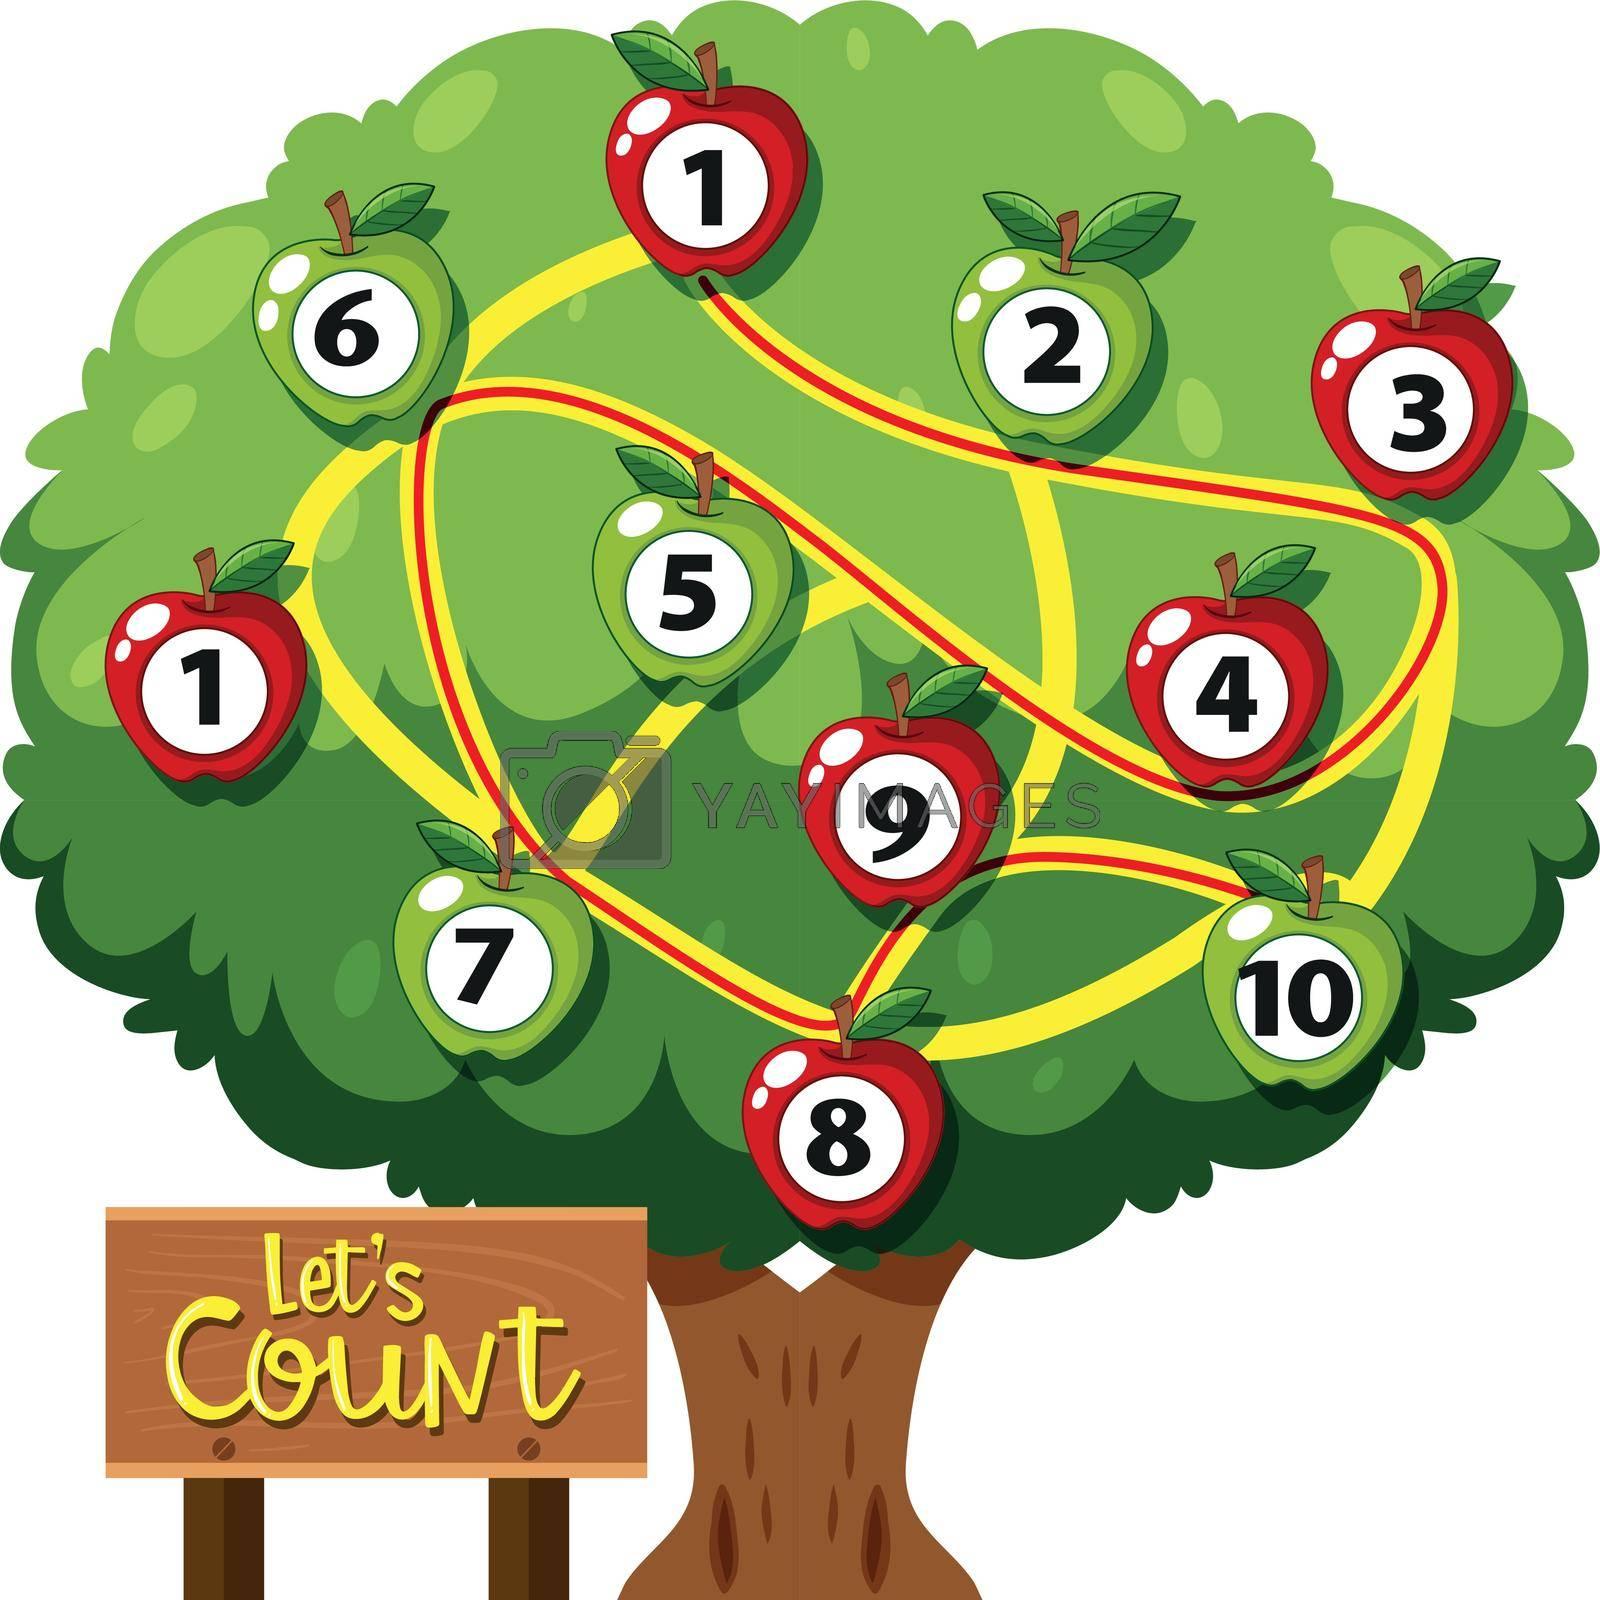 Math count number game illustration